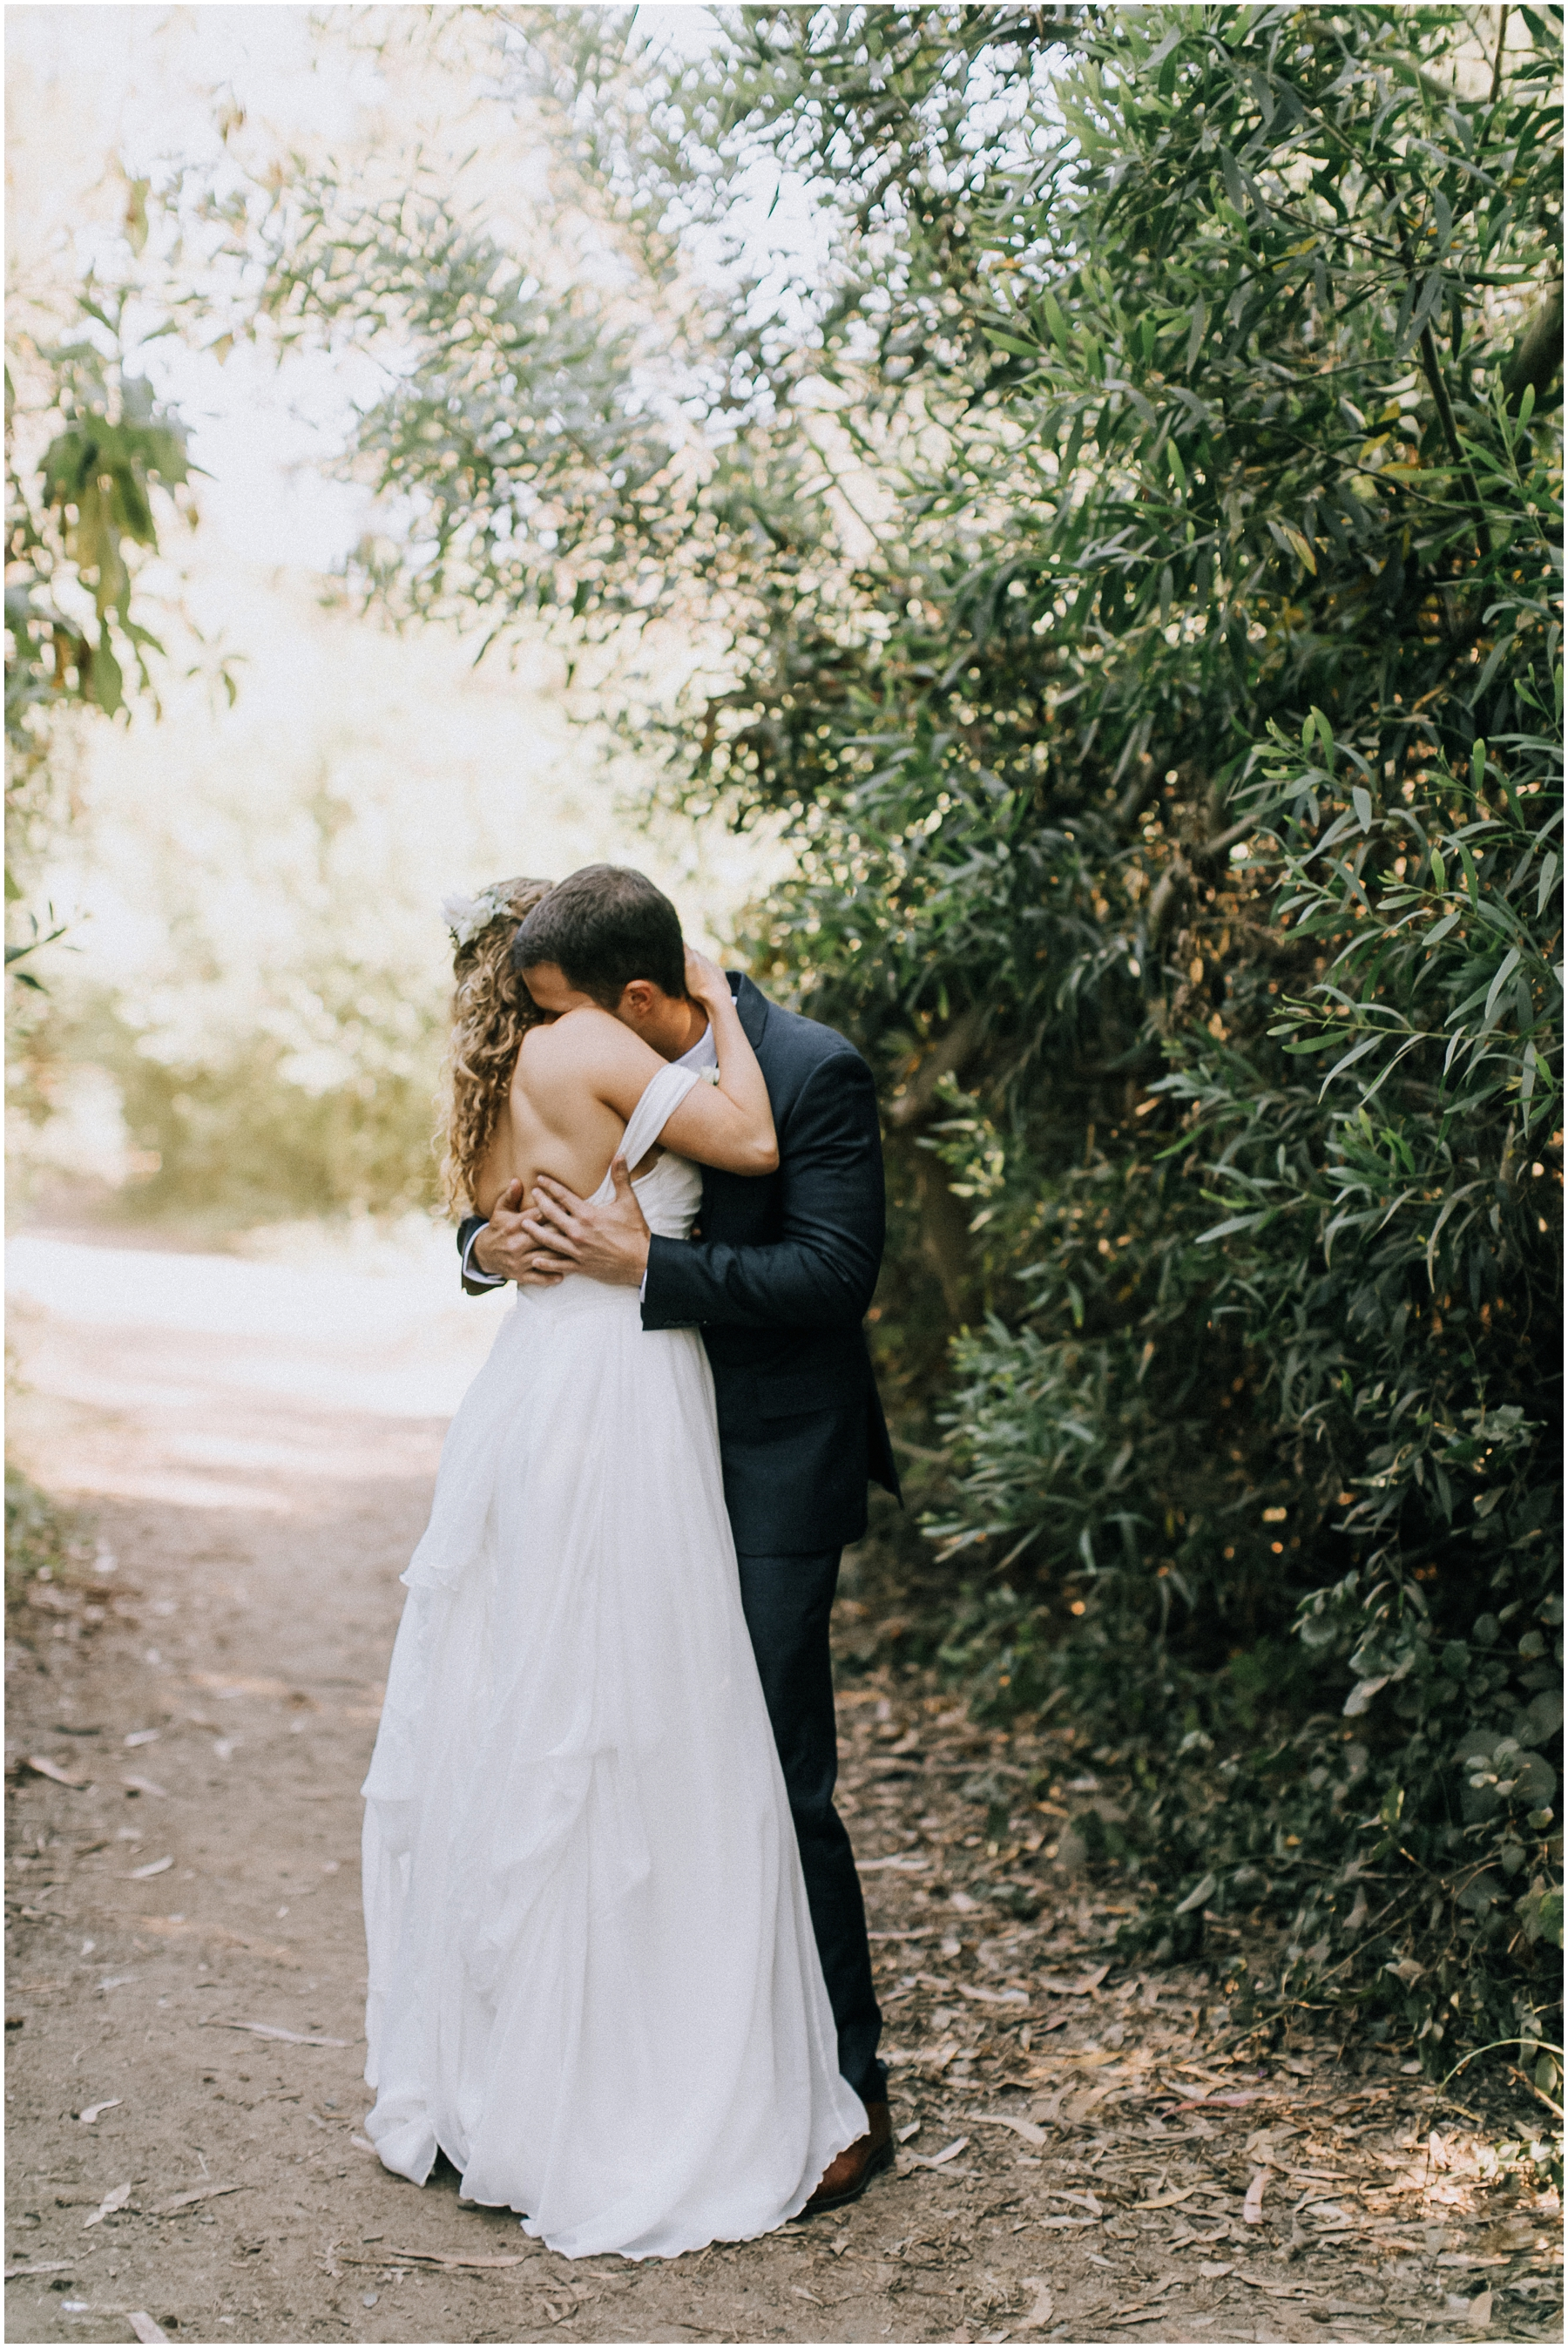 Emily+Paul-WEDDING_KellyBoitanoPhotography_0030